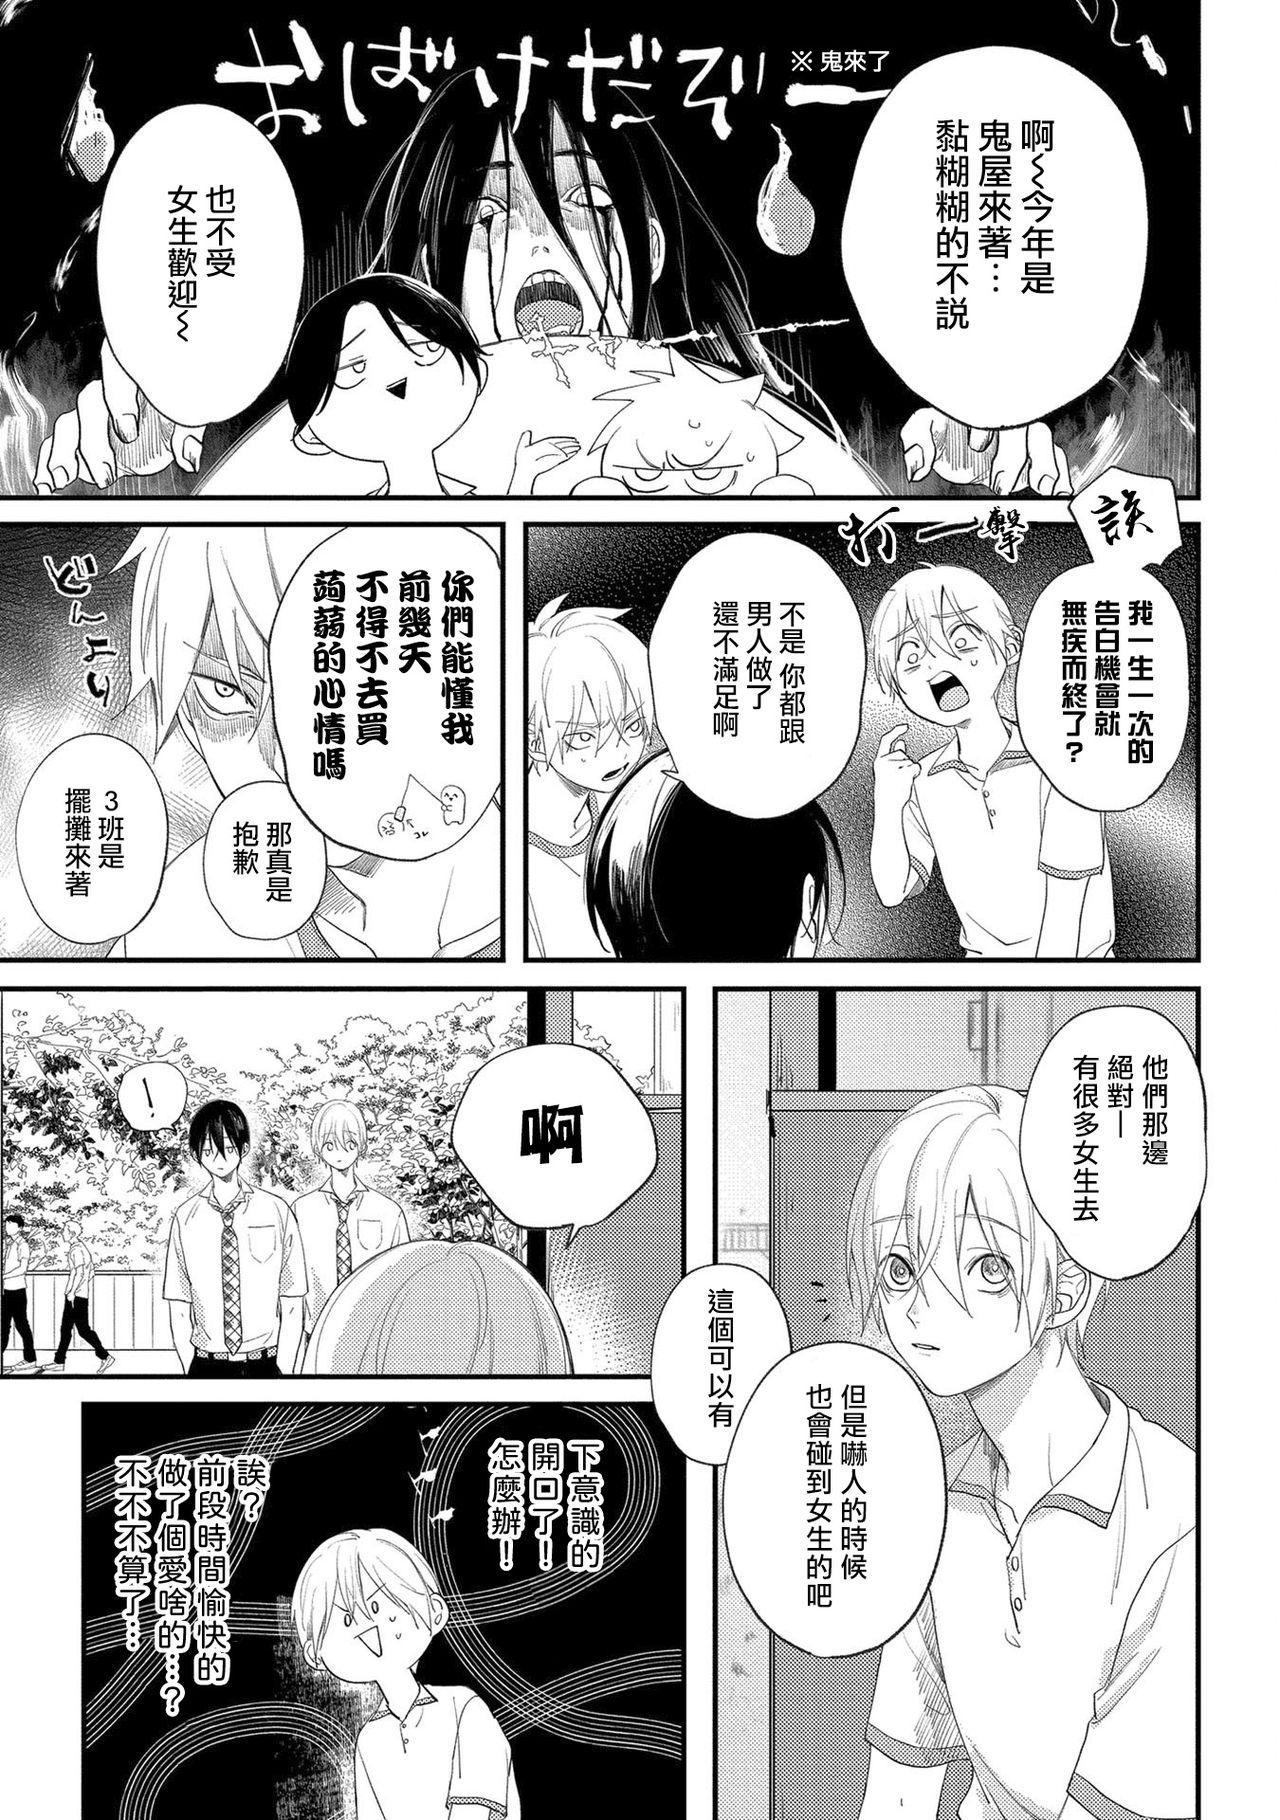 [Utata Hakuto] Houkago Virginity - Virginity afterschool 1-3 [Chinese] [拾荒者汉化组] [Digital] 37